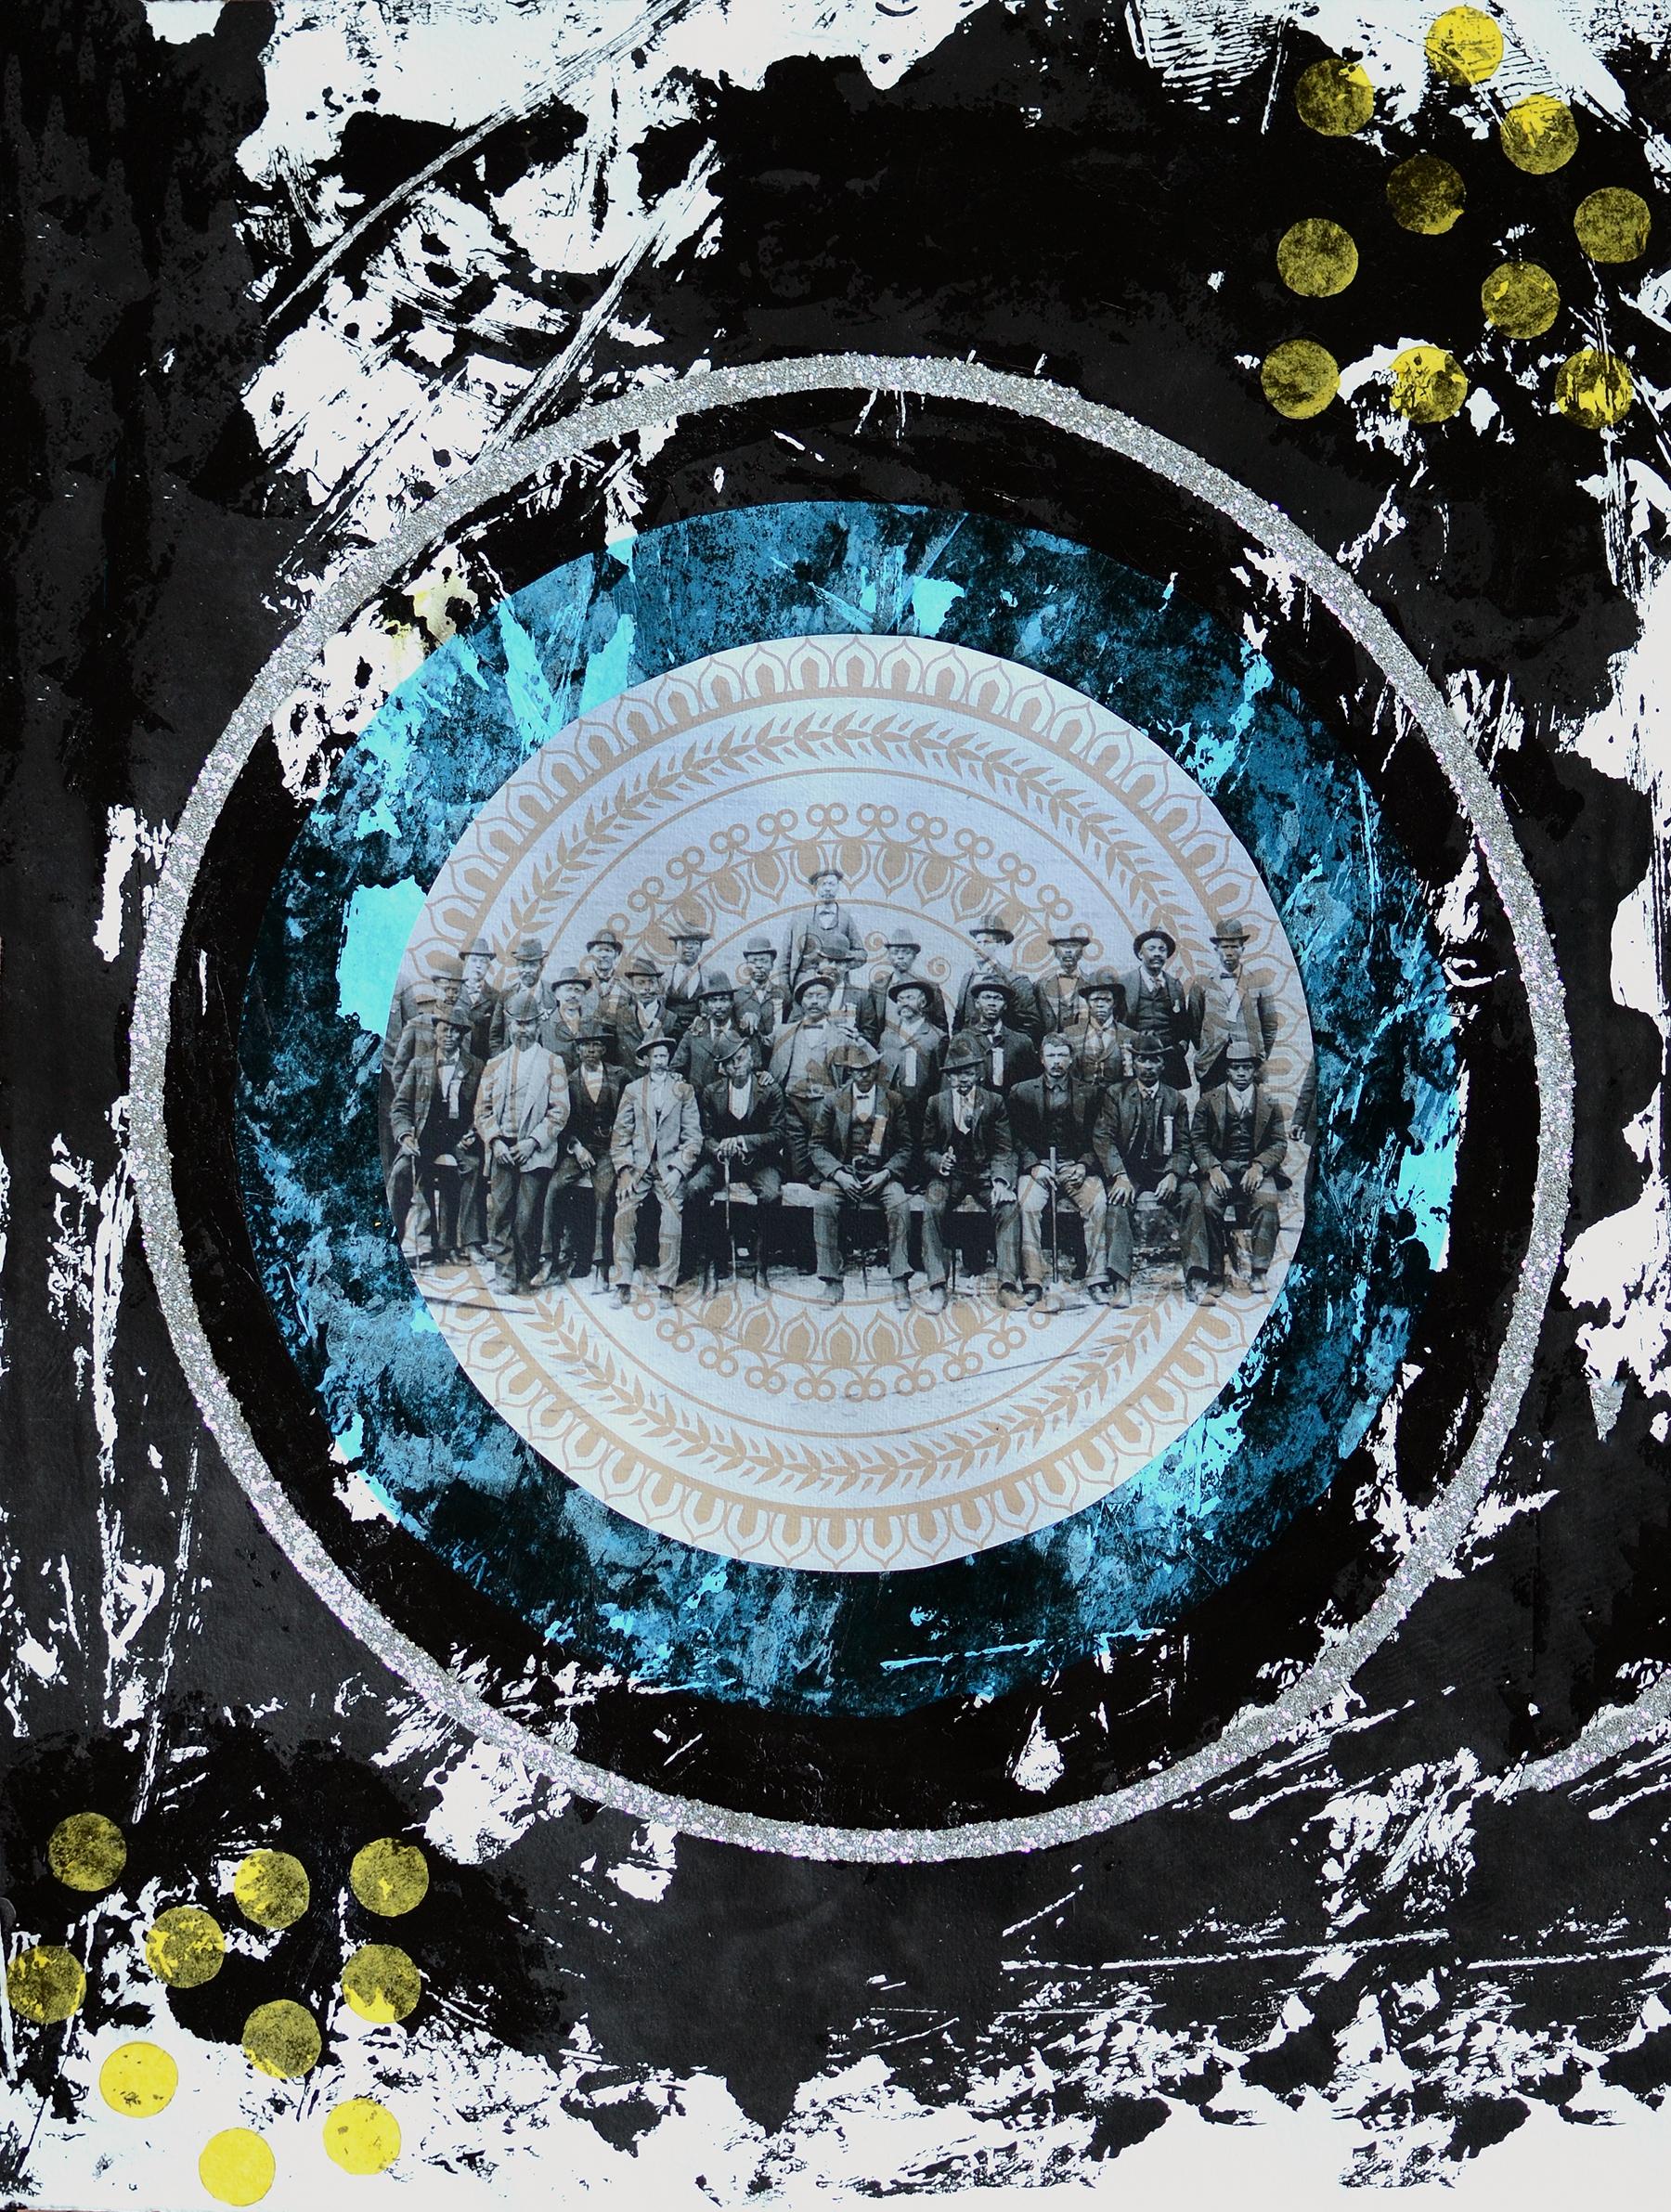 Phonological Loop  , 2016 Black gesso, gel medium, archival pigment ink, tissue, glitter on watercolor paper 30 x 22.5 in.